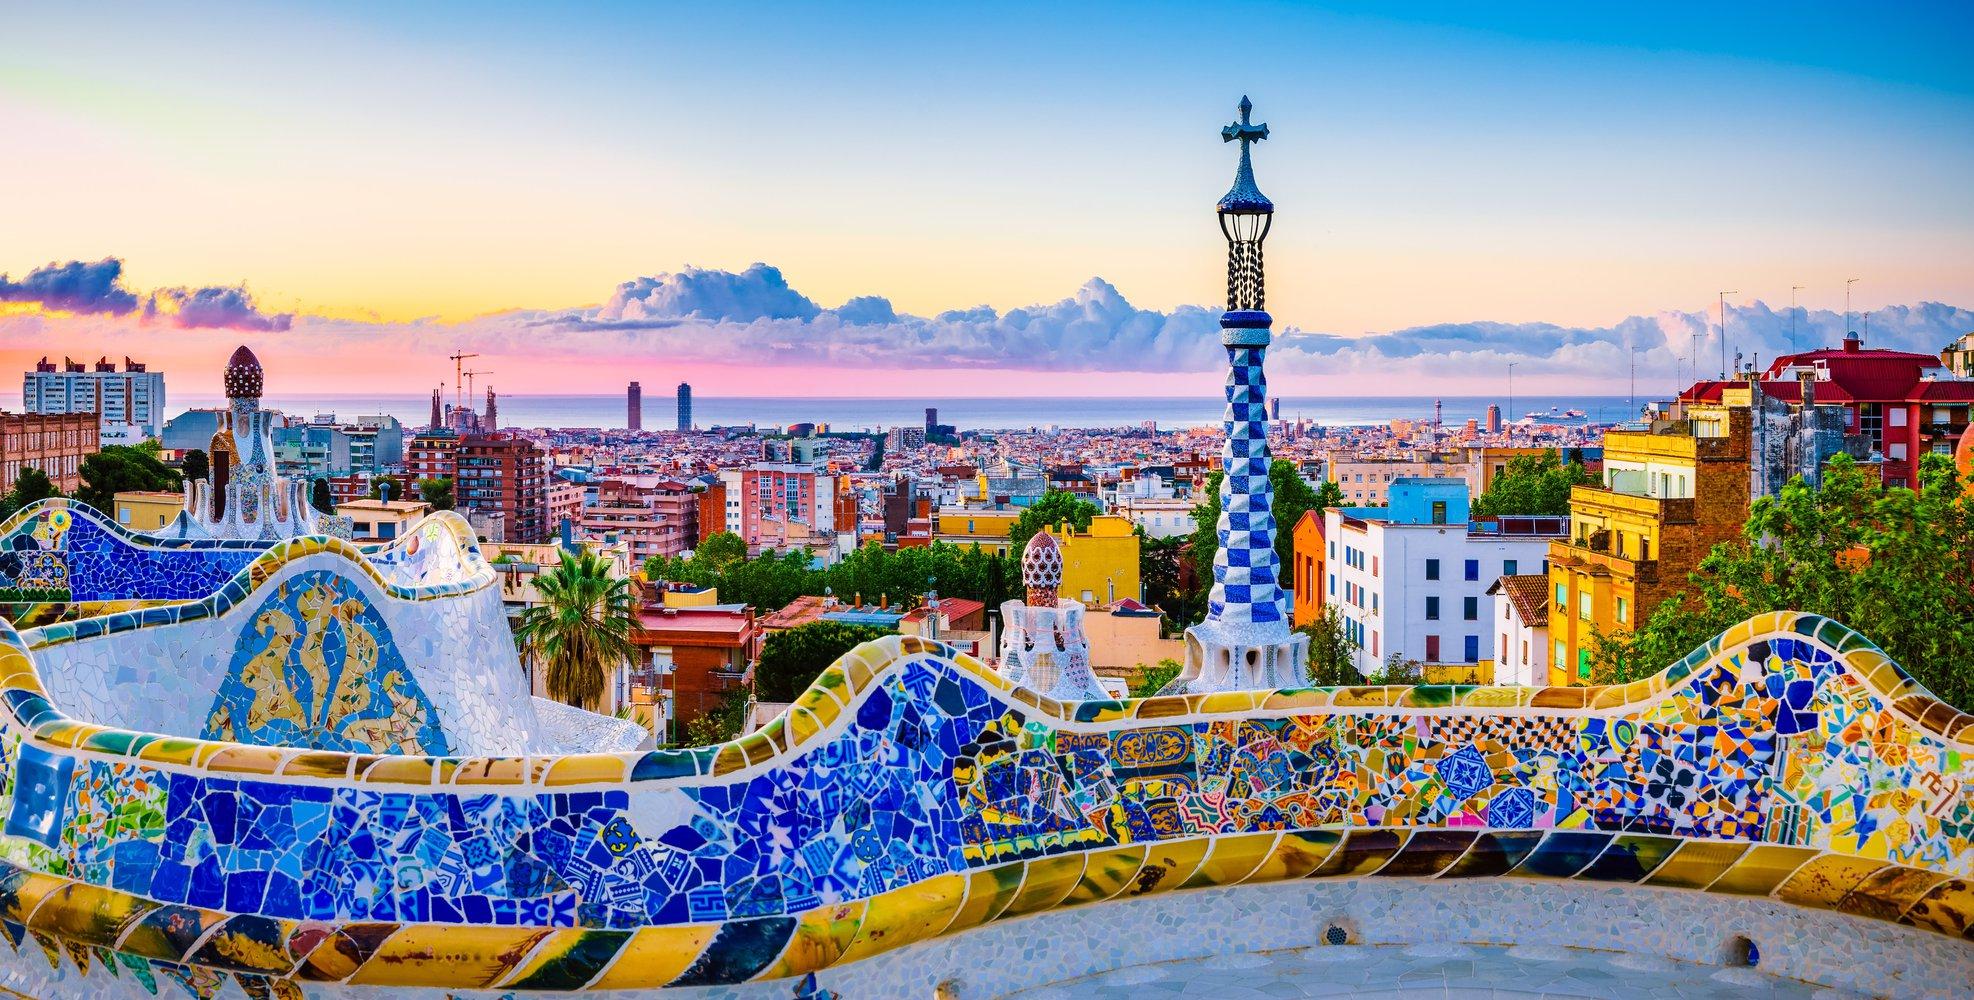 Oferta Viaje a Barcelona